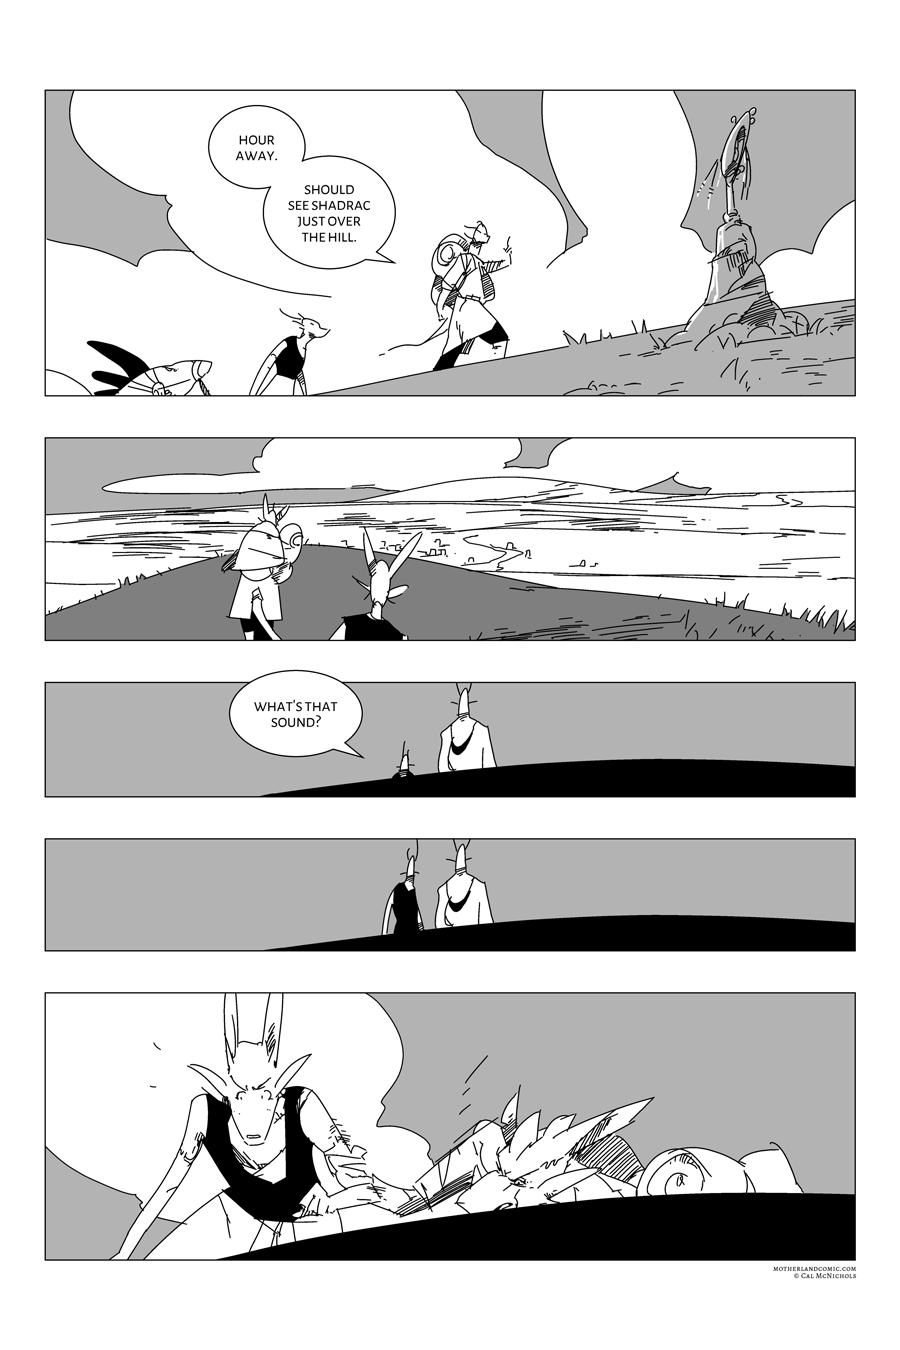 pg 95